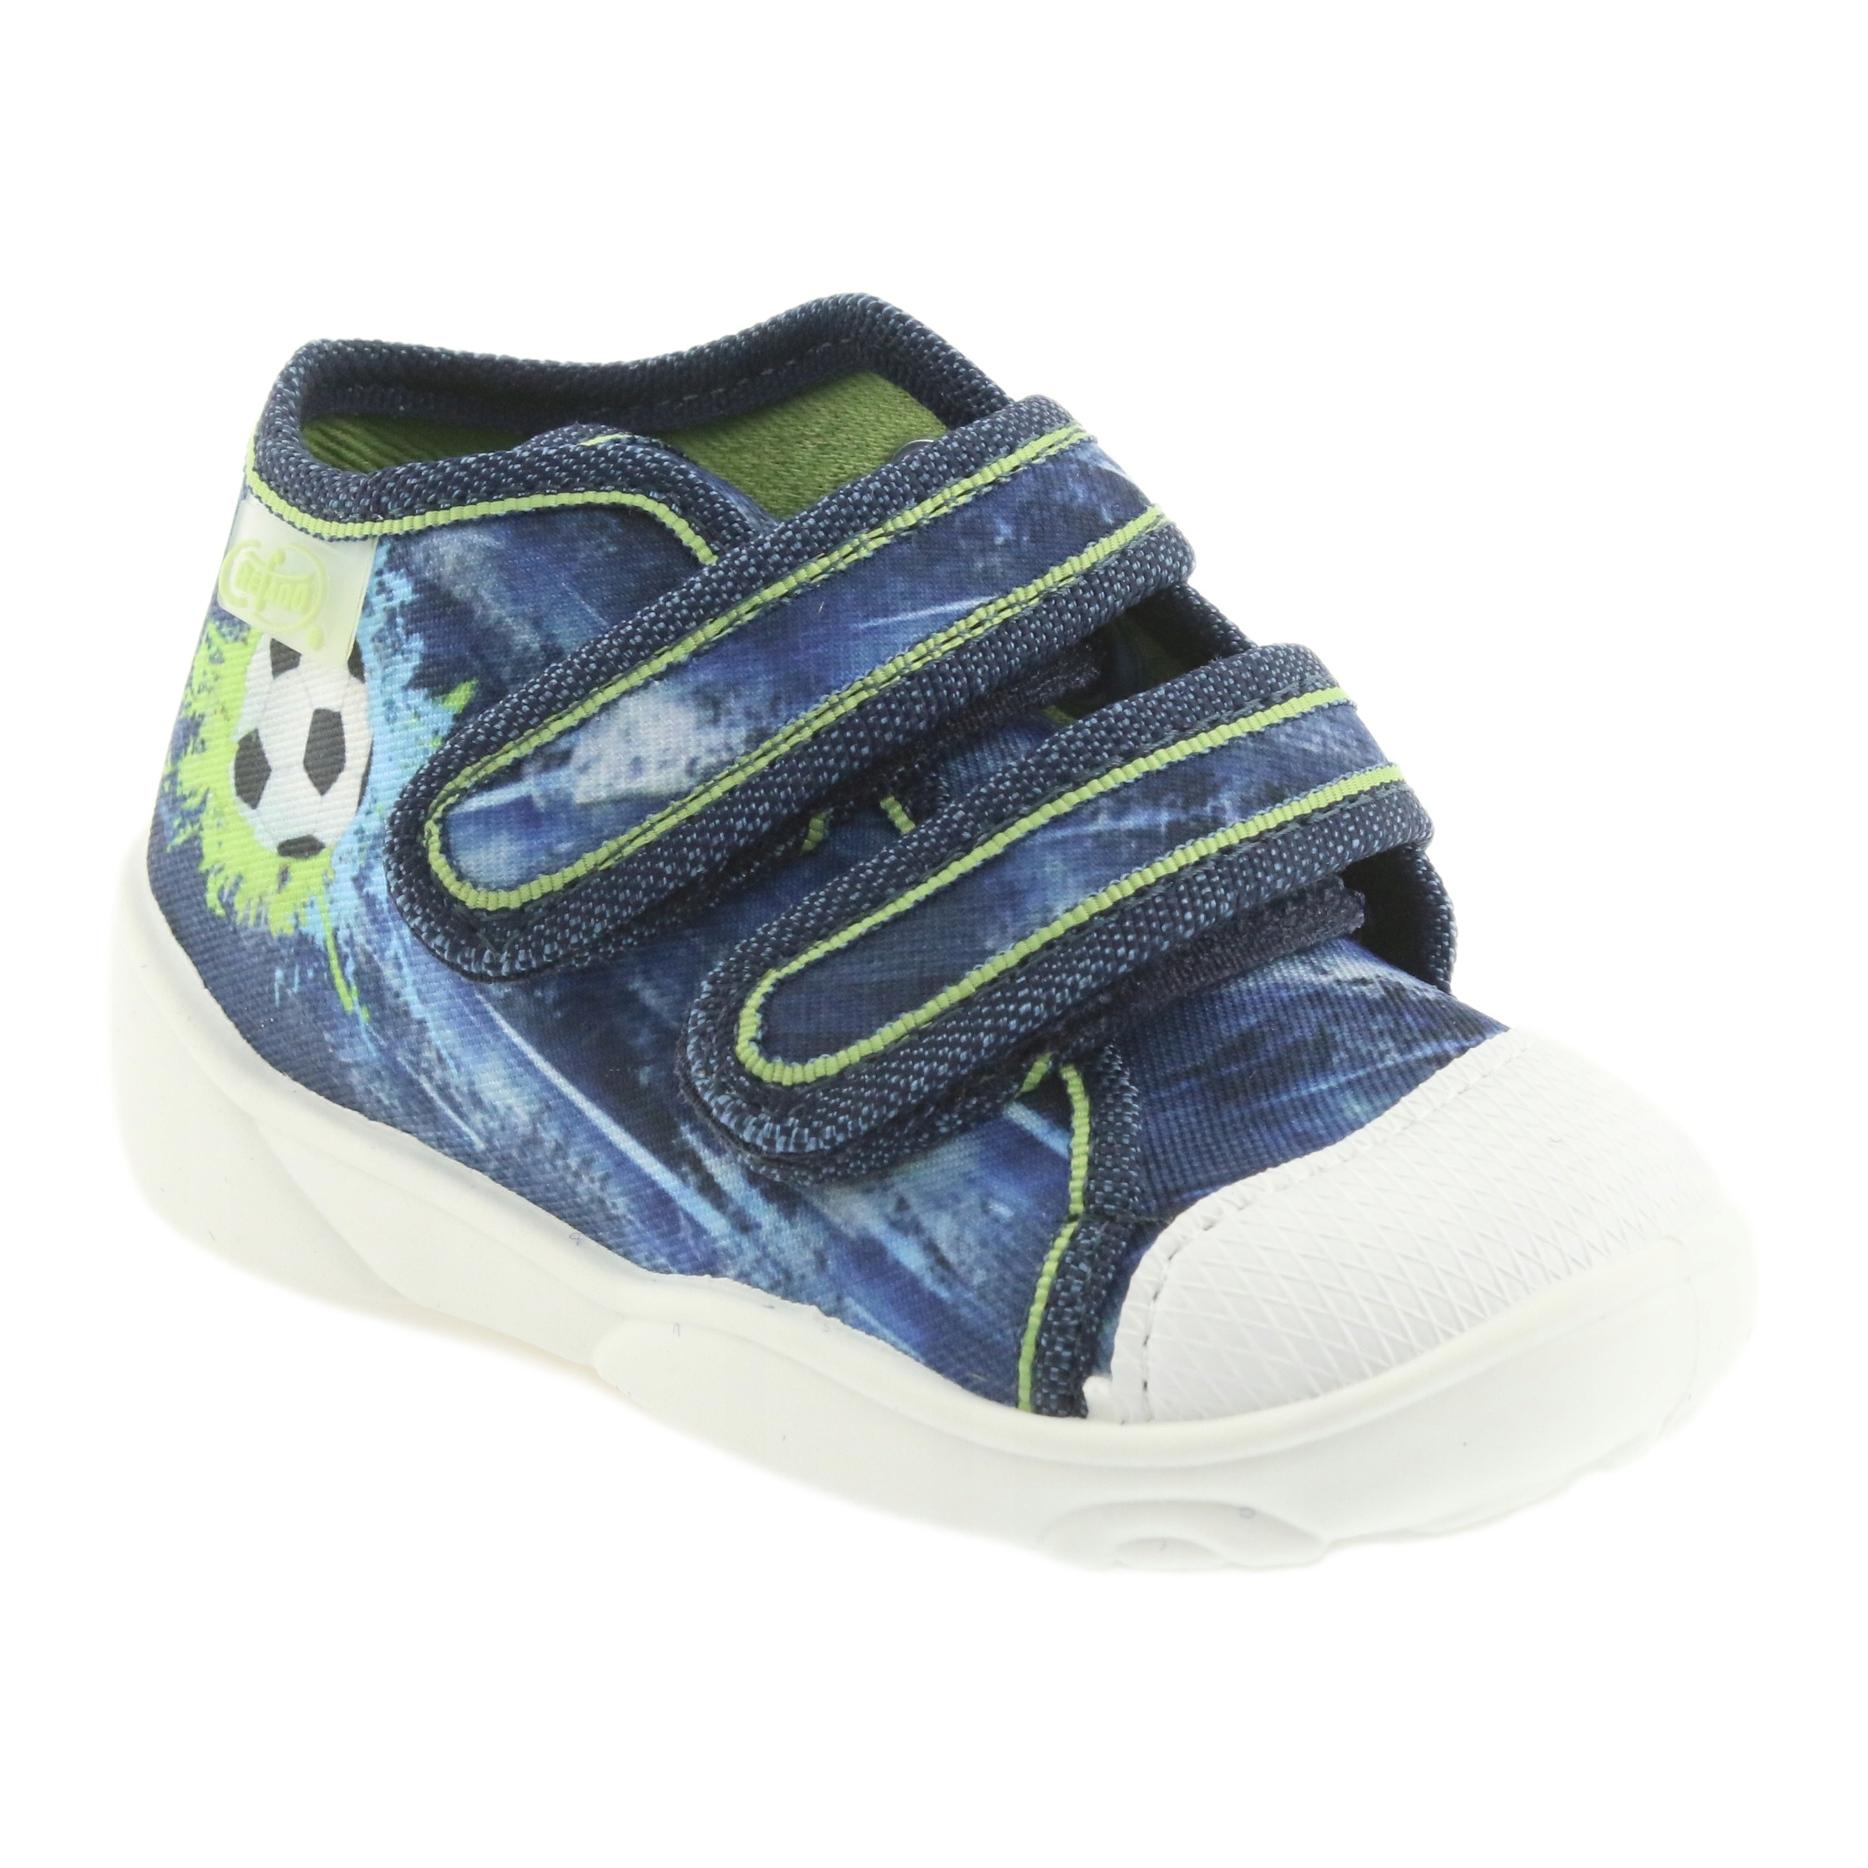 miniatura 2 - Scarpe da calcio per bambini Befado 212P058 blu verde marina